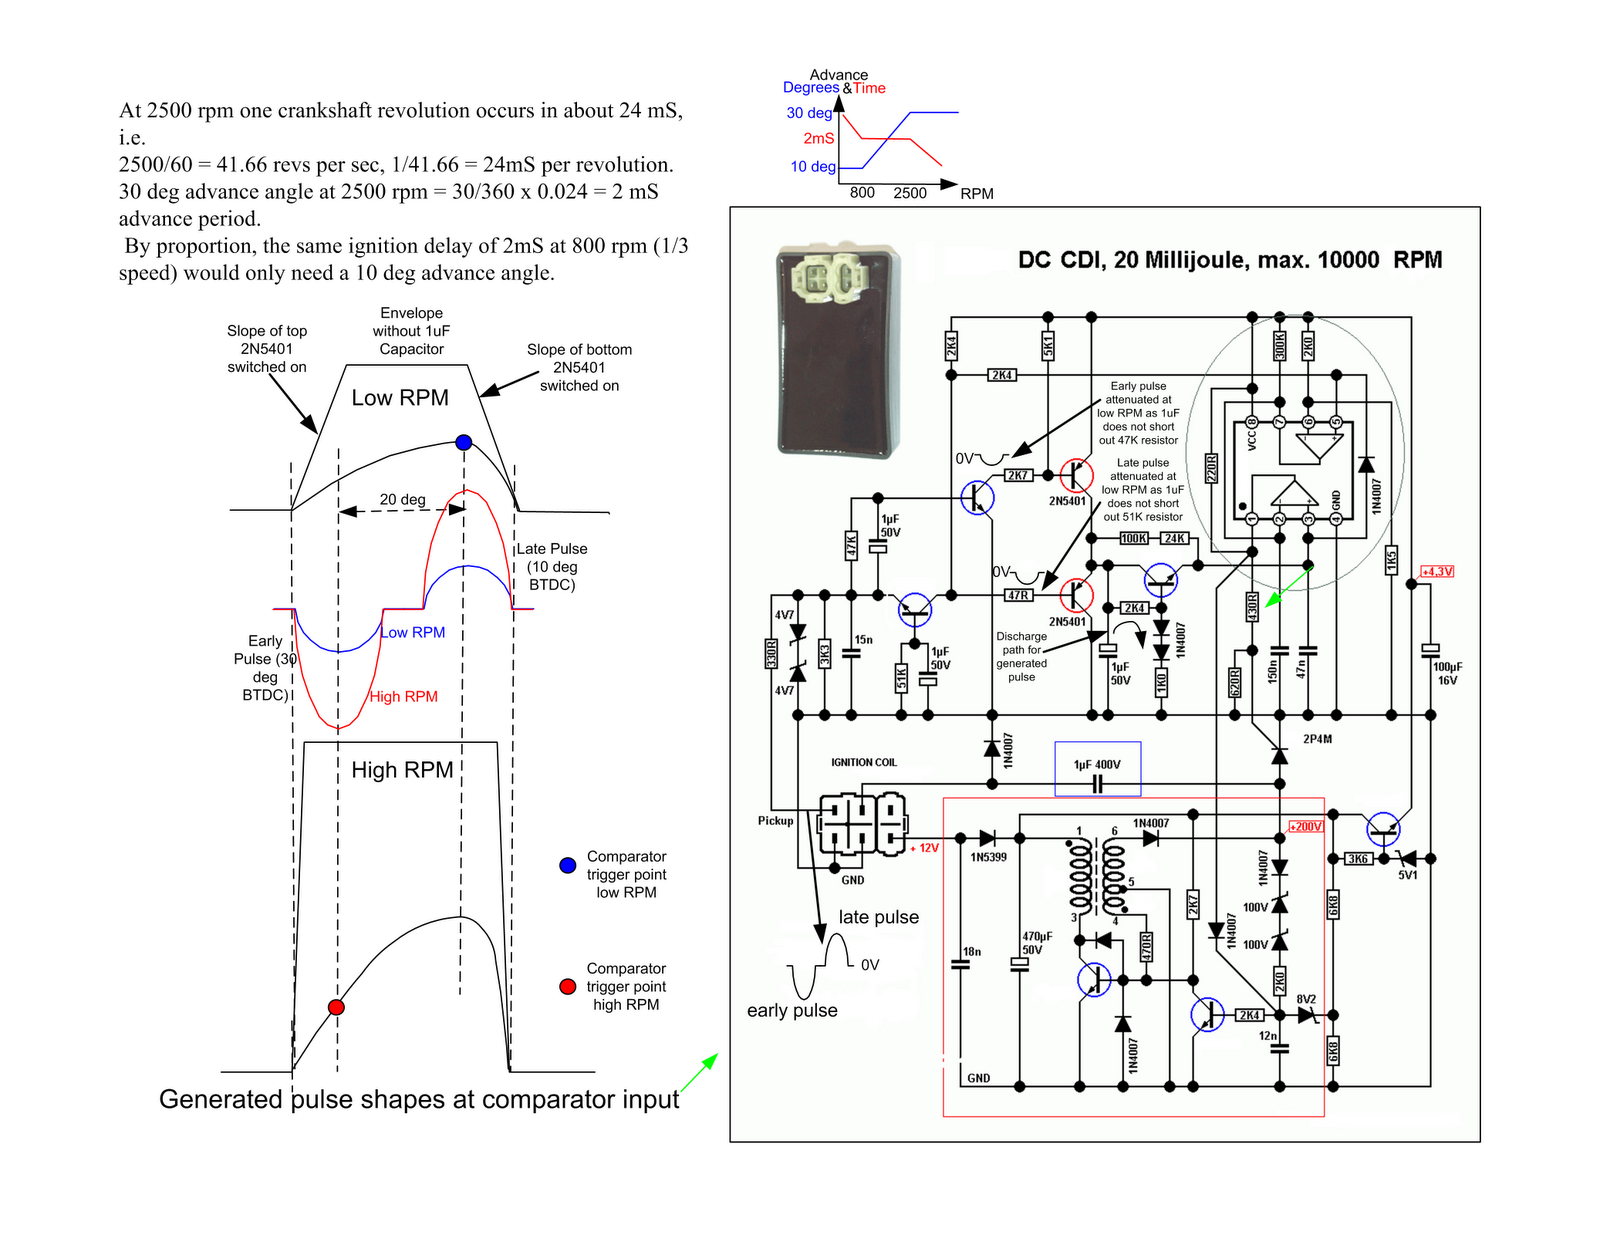 hight resolution of ng1 wiring diagram dc dc wiring diagrams 4 wire dc motor wiring diagram ng1 wiring diagram dc dc